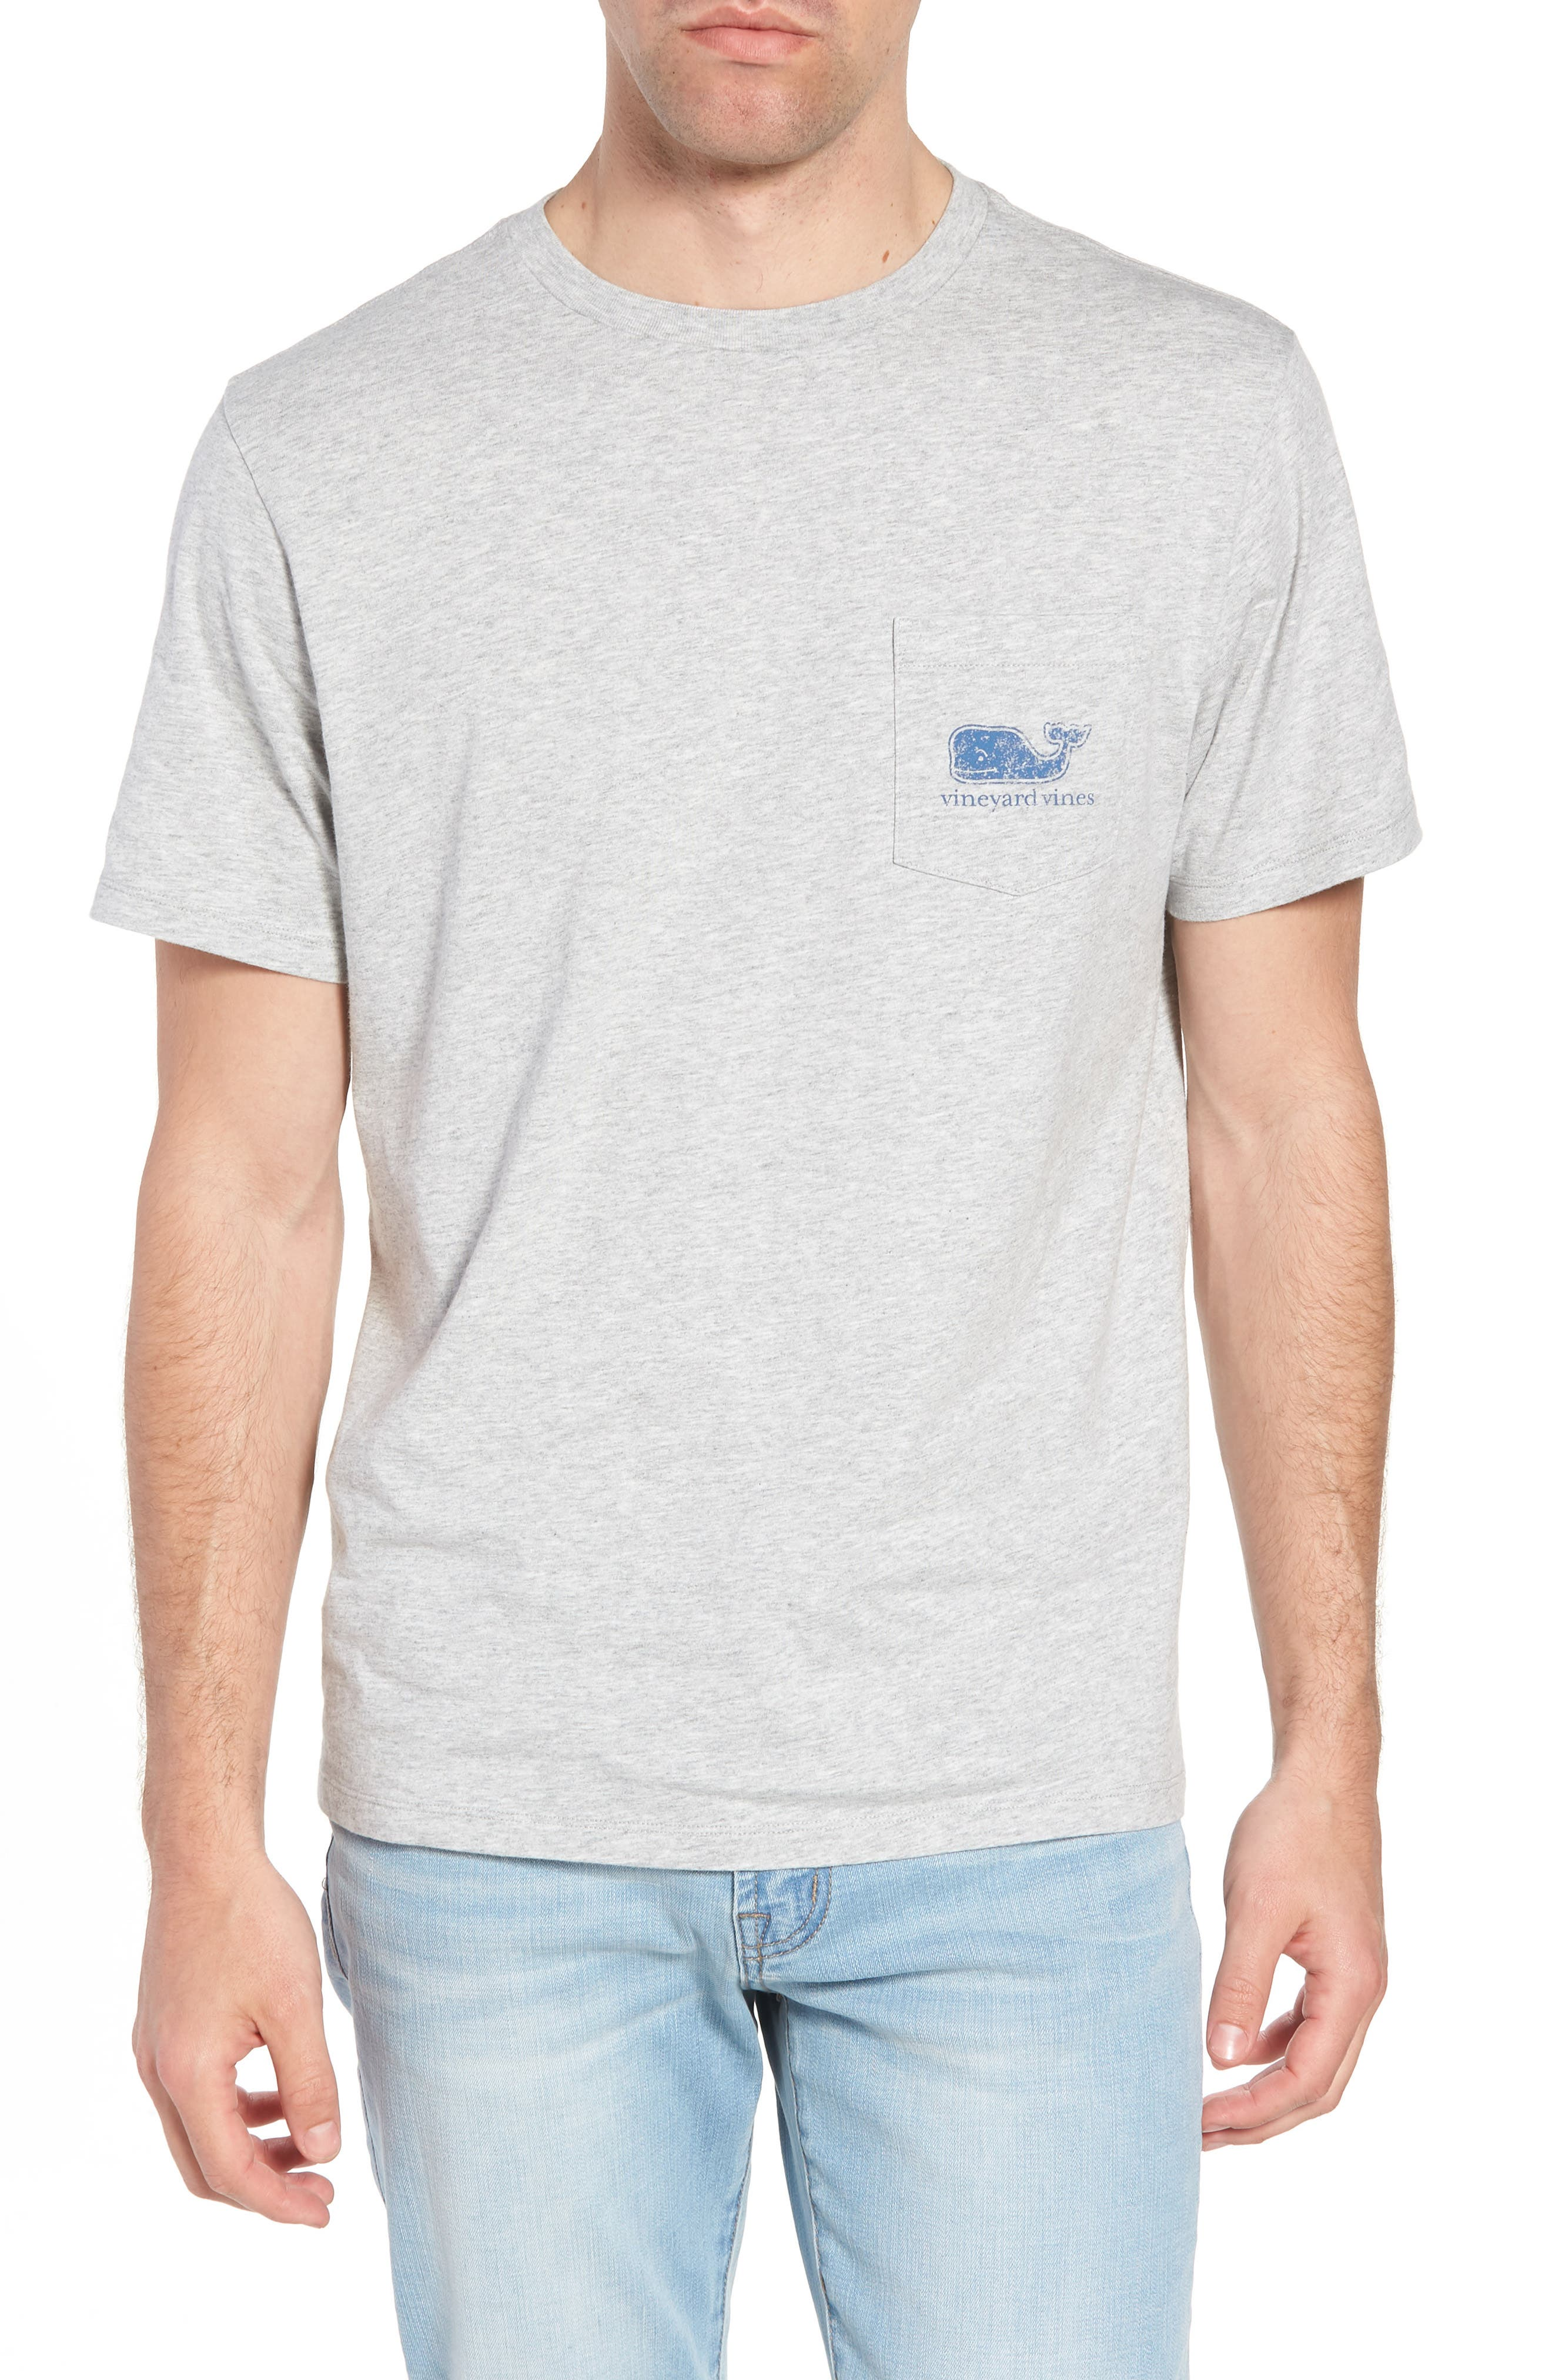 Whale Crewneck T-Shirt,                             Main thumbnail 1, color,                             GREY HEATHER